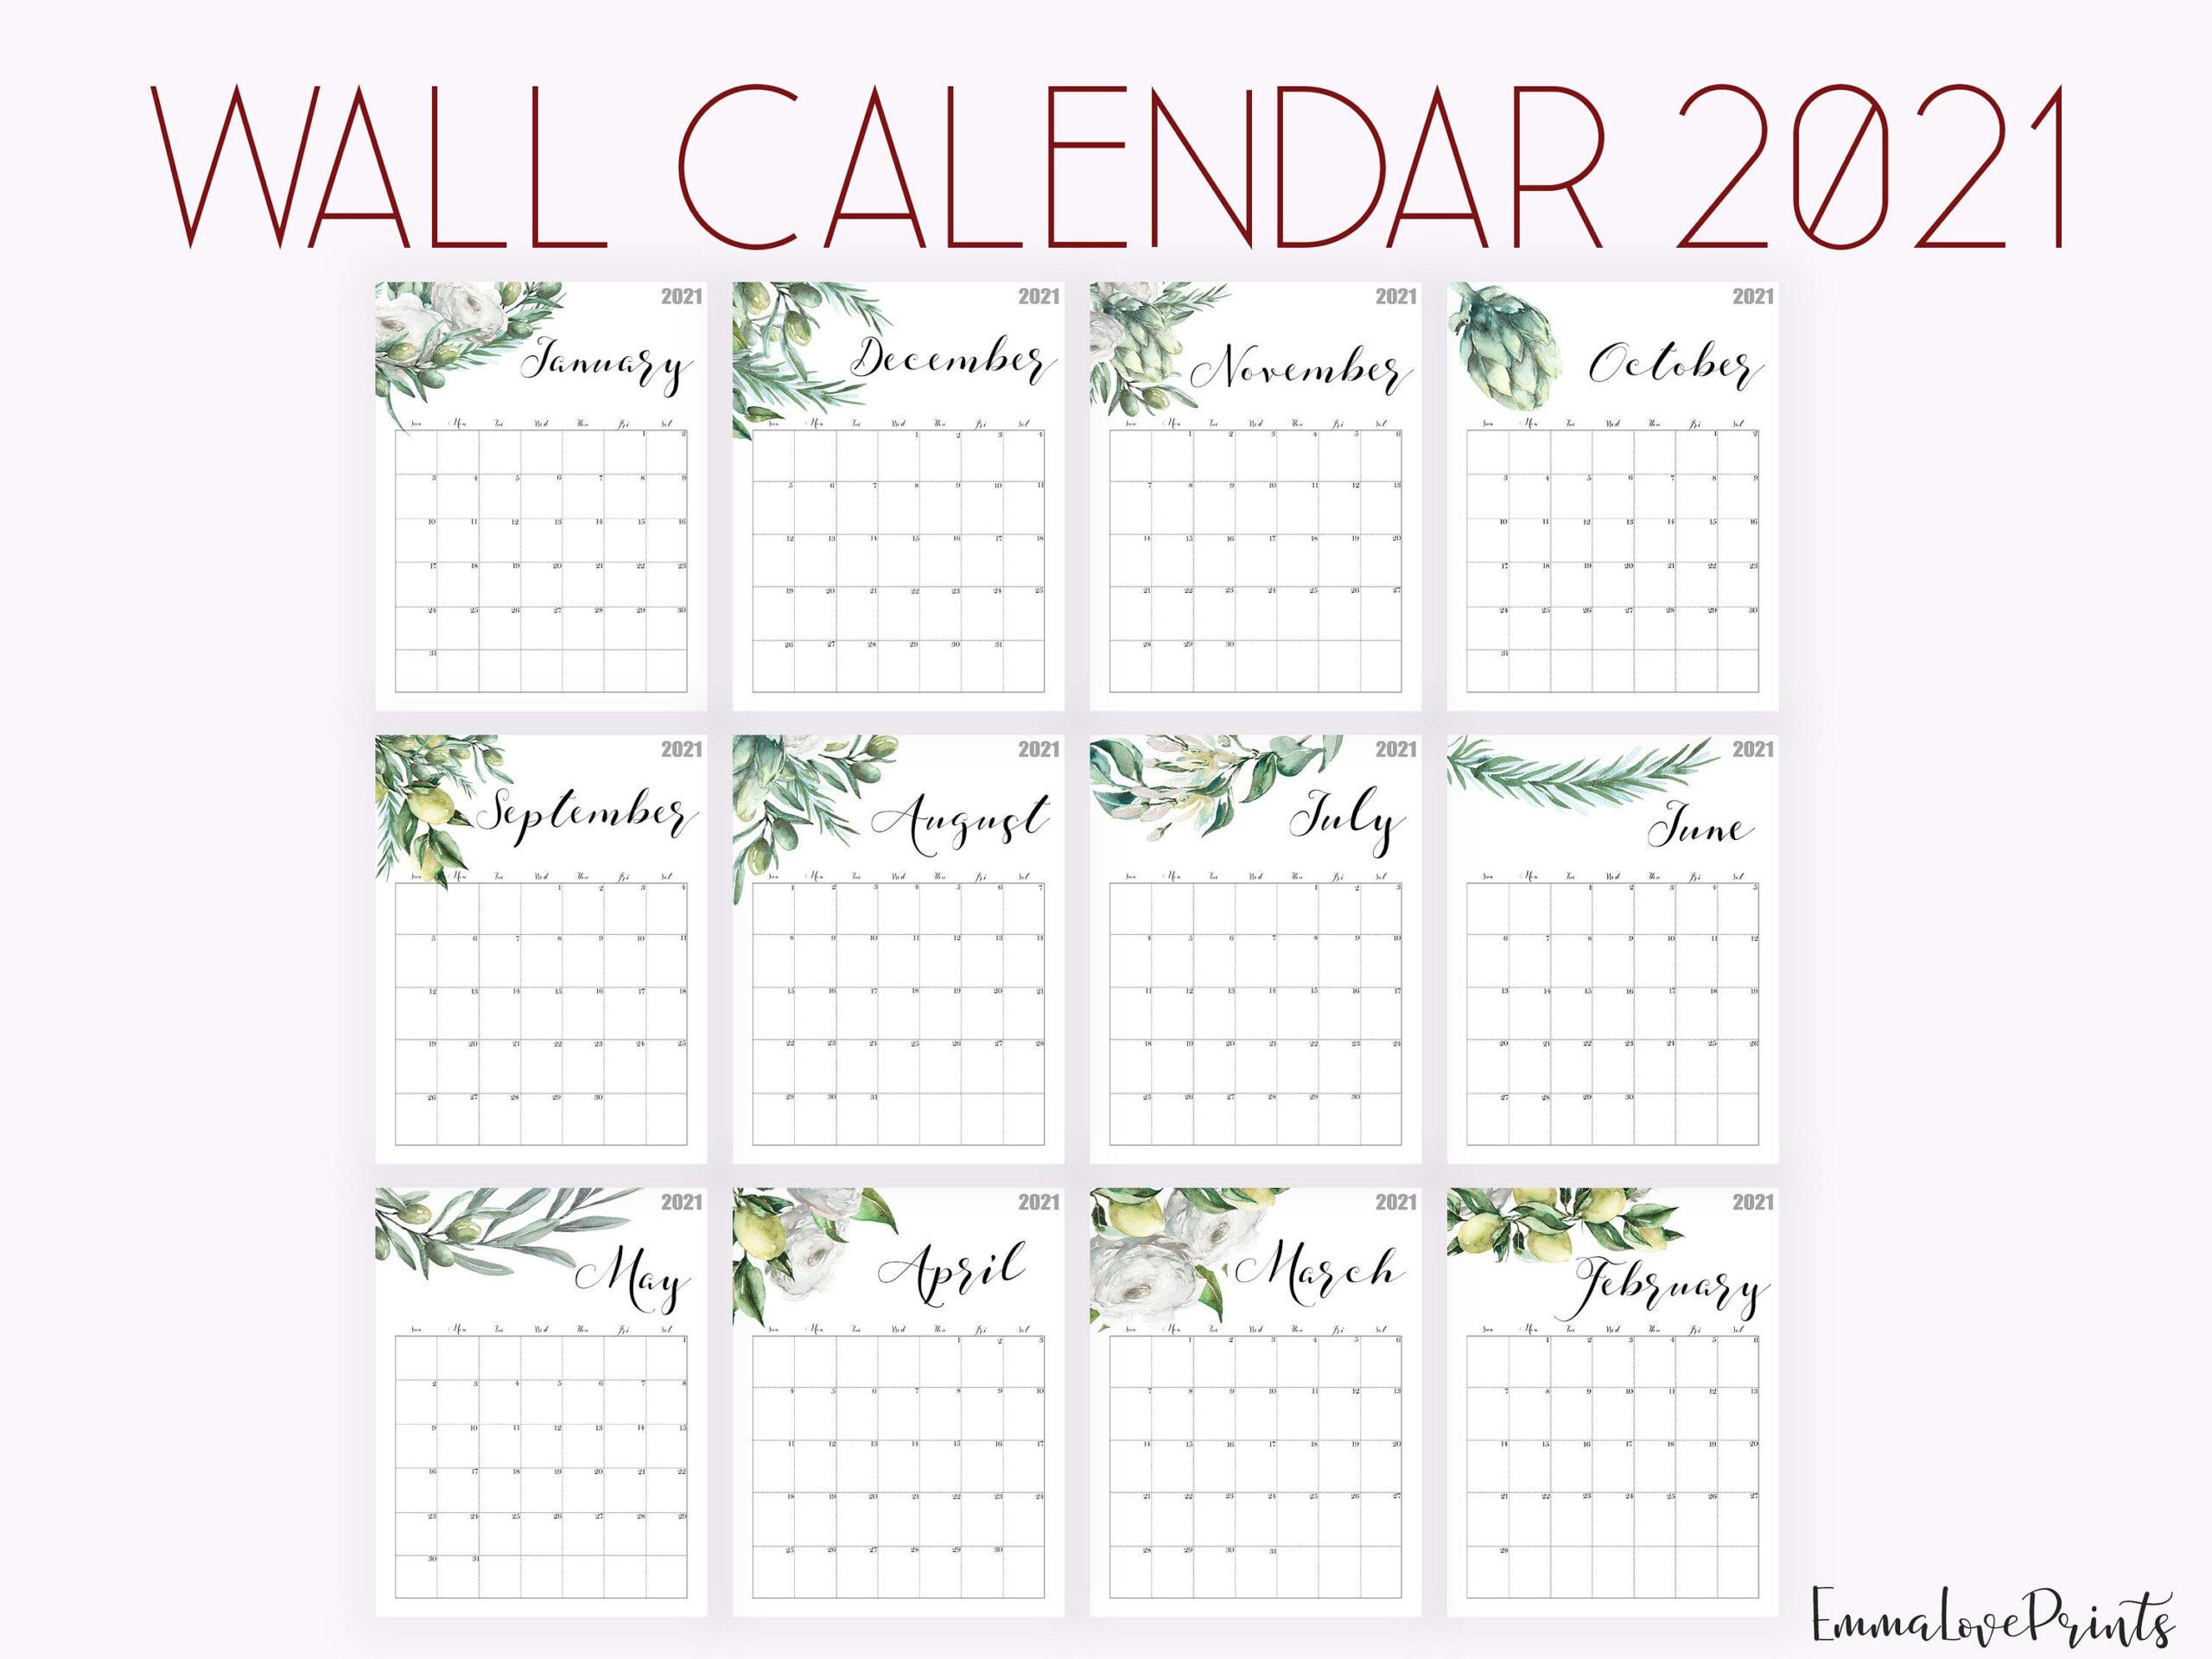 2021 Calendar Watercolour Calendar 2021 Botanical Wall